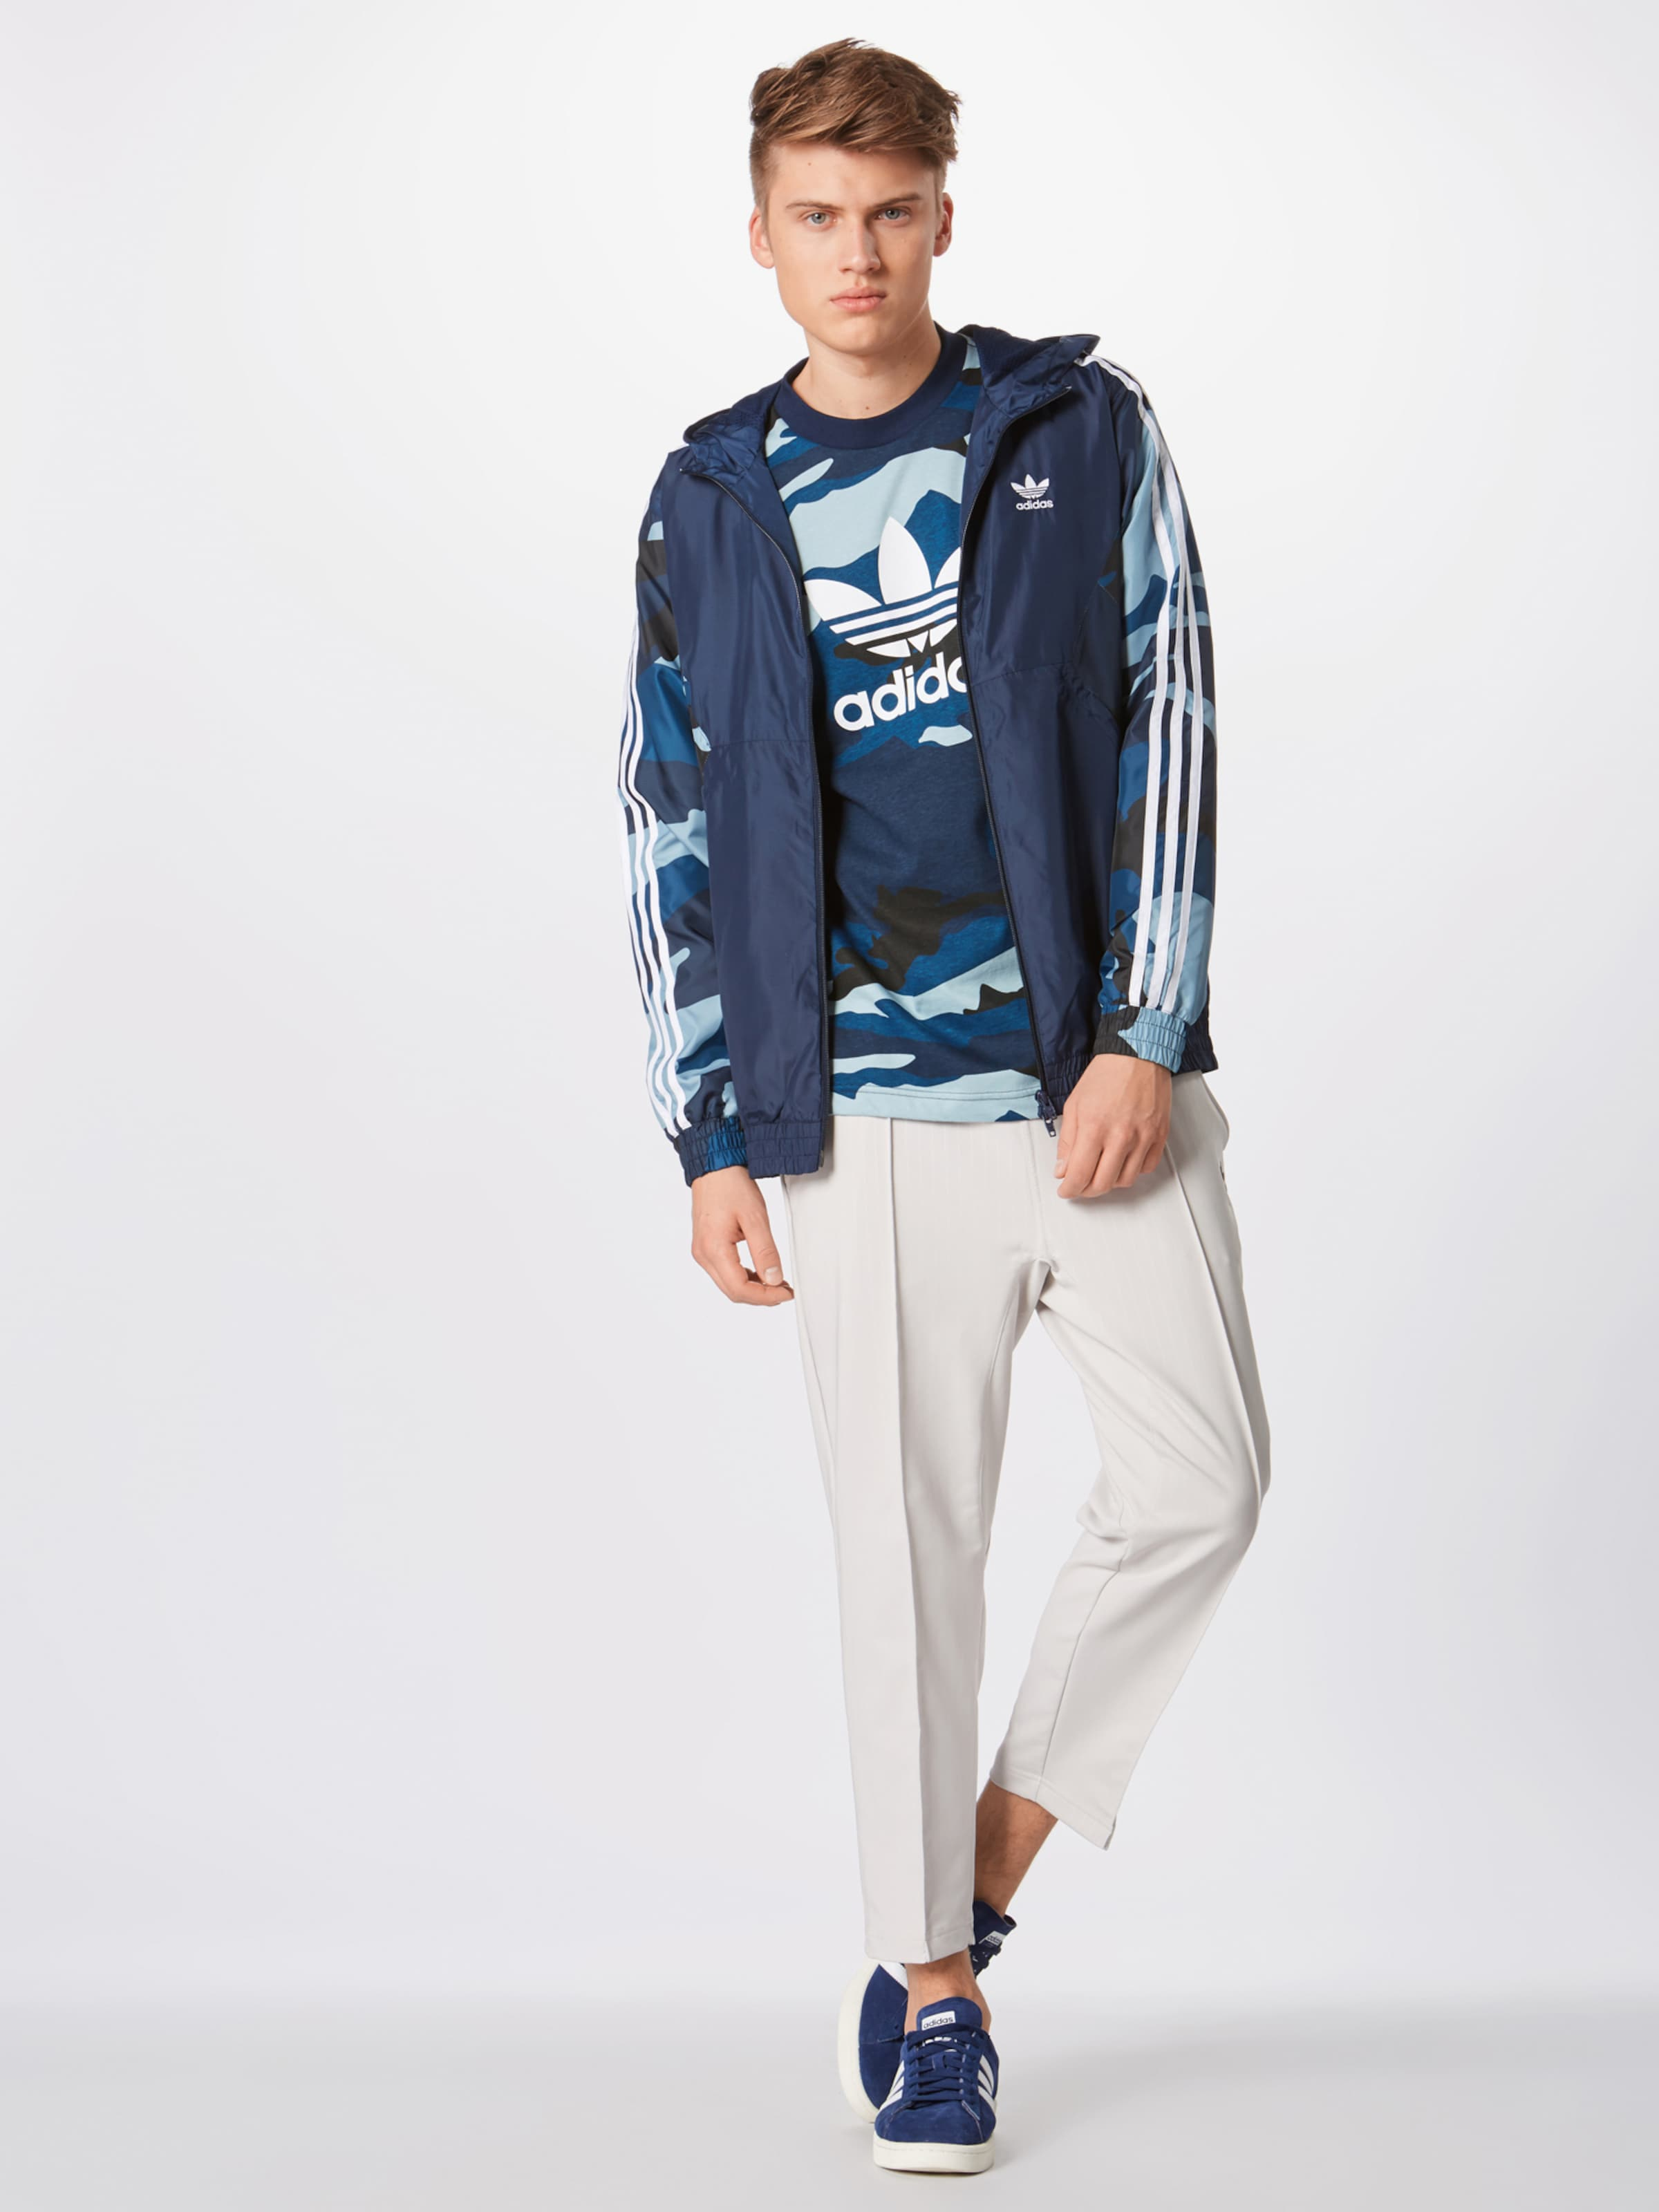 Bleu De En MarineMélange T 'camo Tee' Adidas Originals shirt Couleurs g7yYbfv6